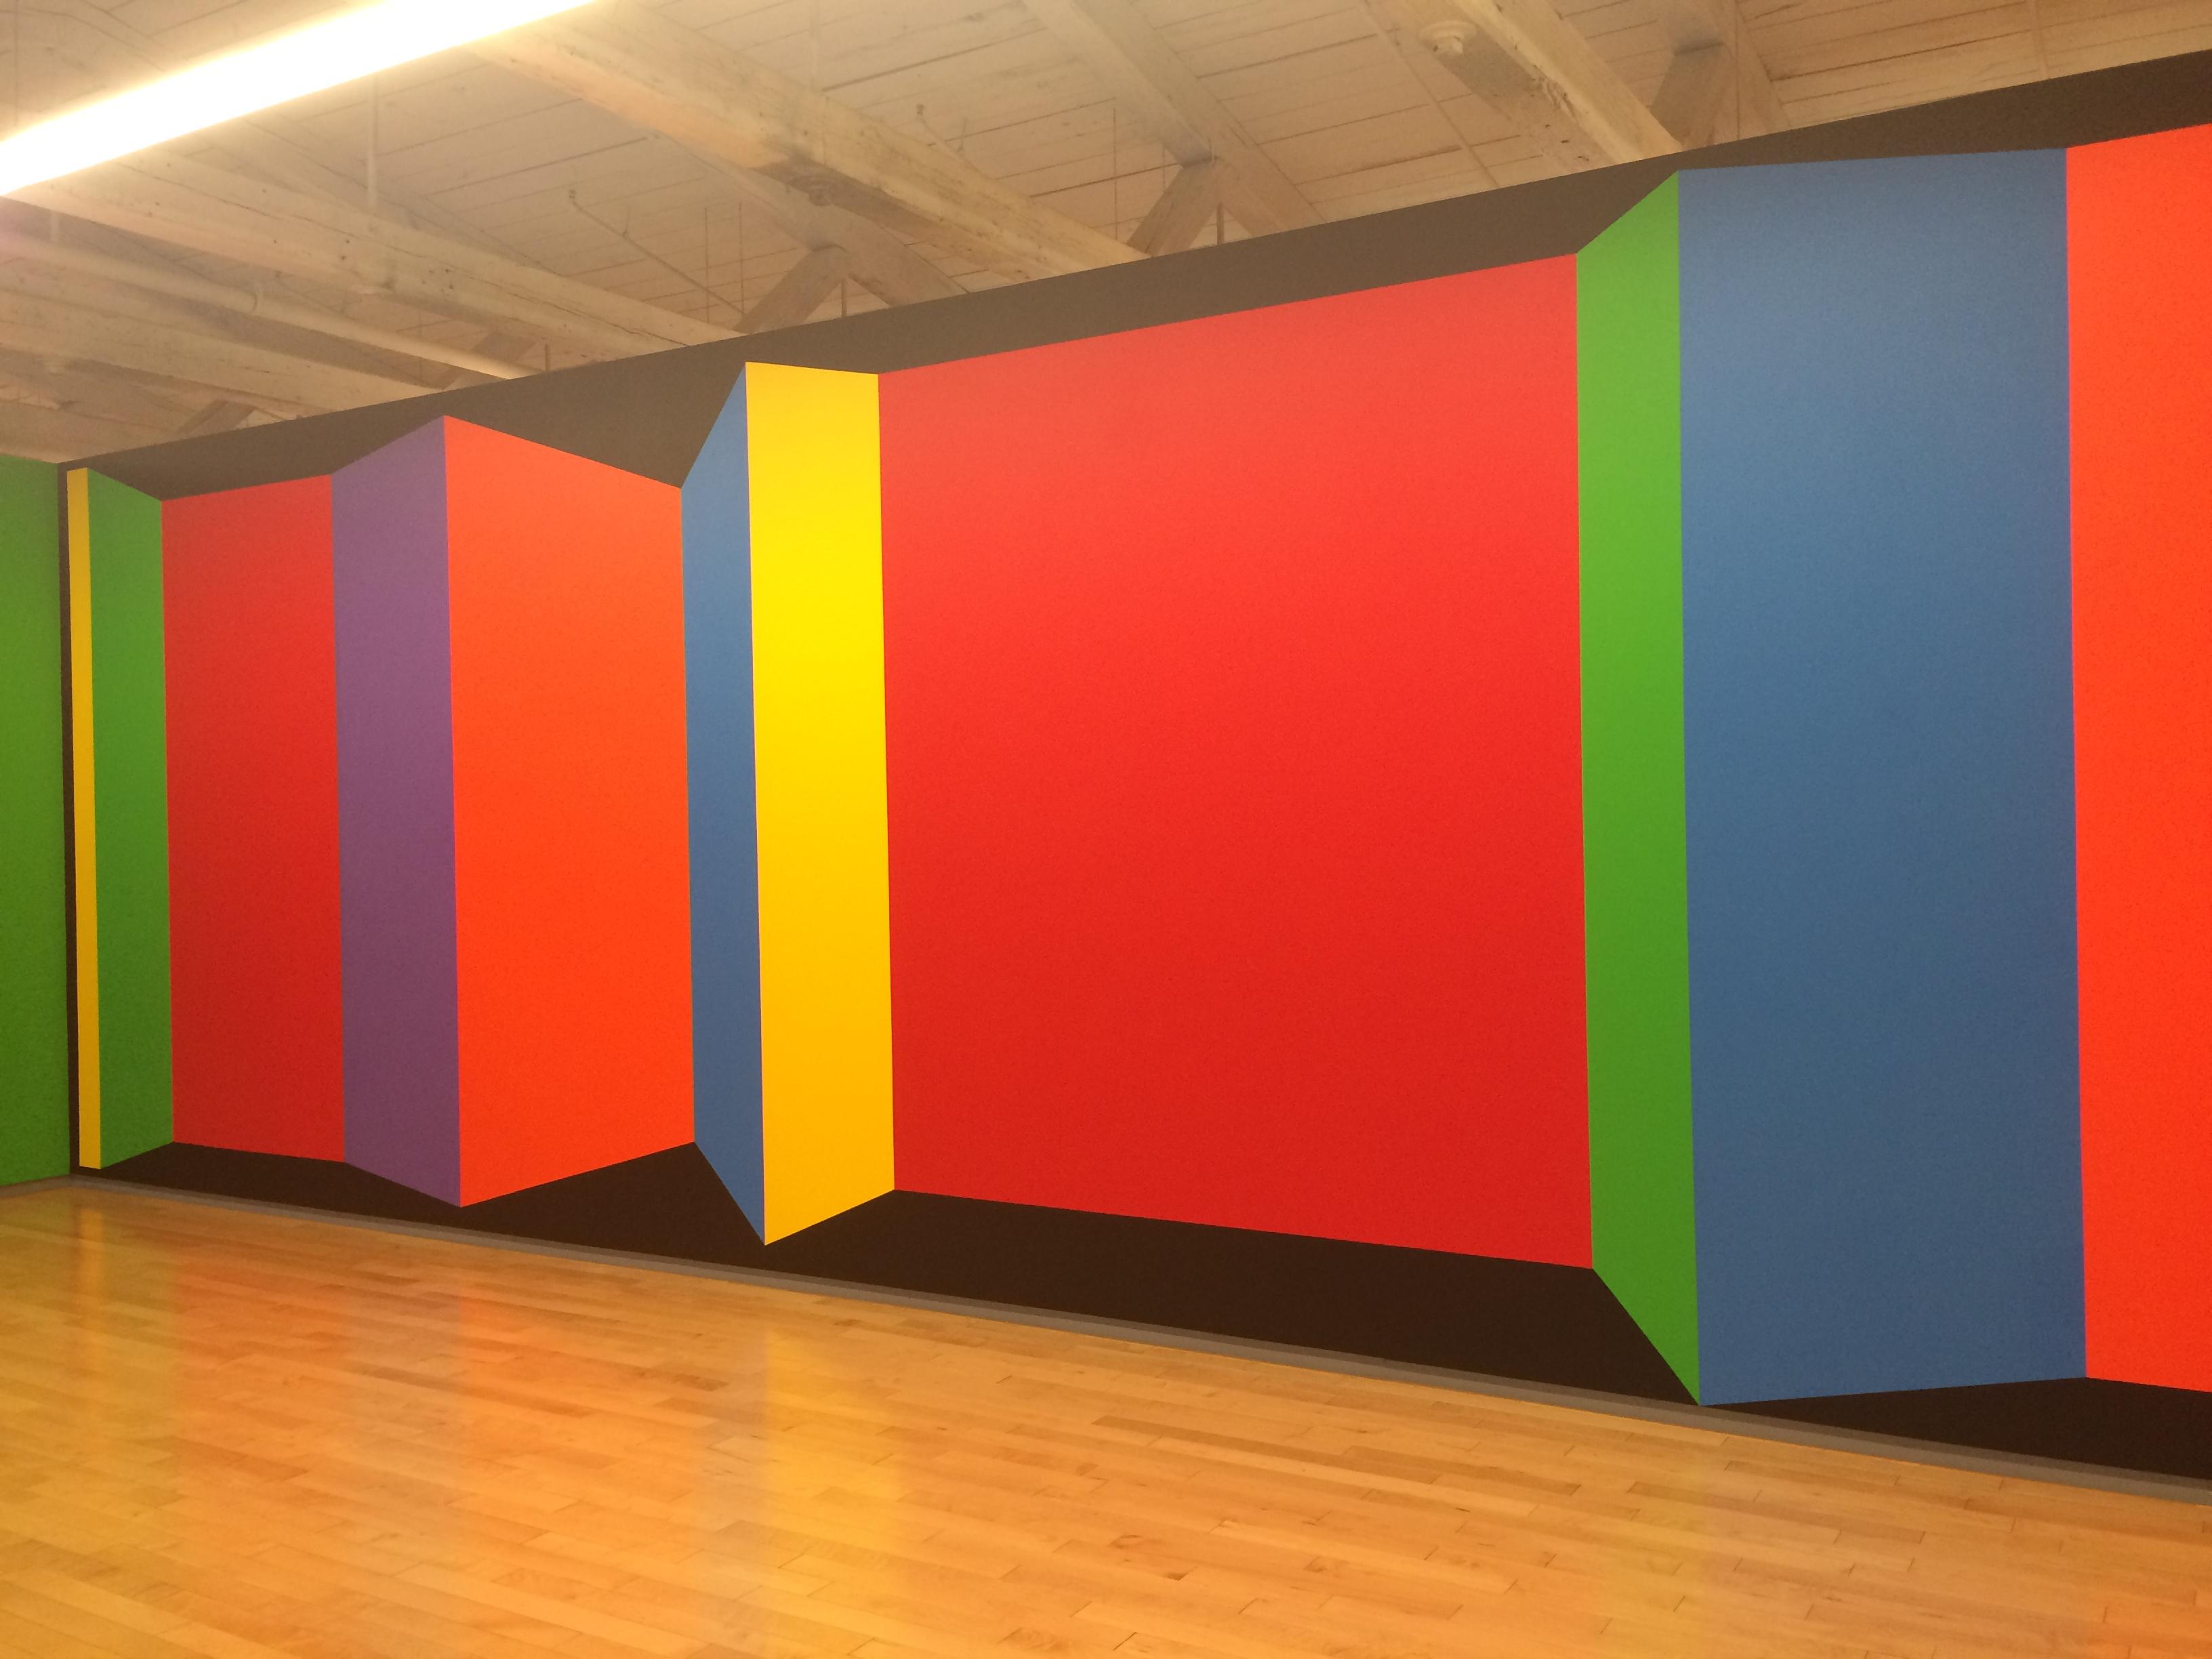 Exhibition Sol Lewitt At Mass Moca Part One Color